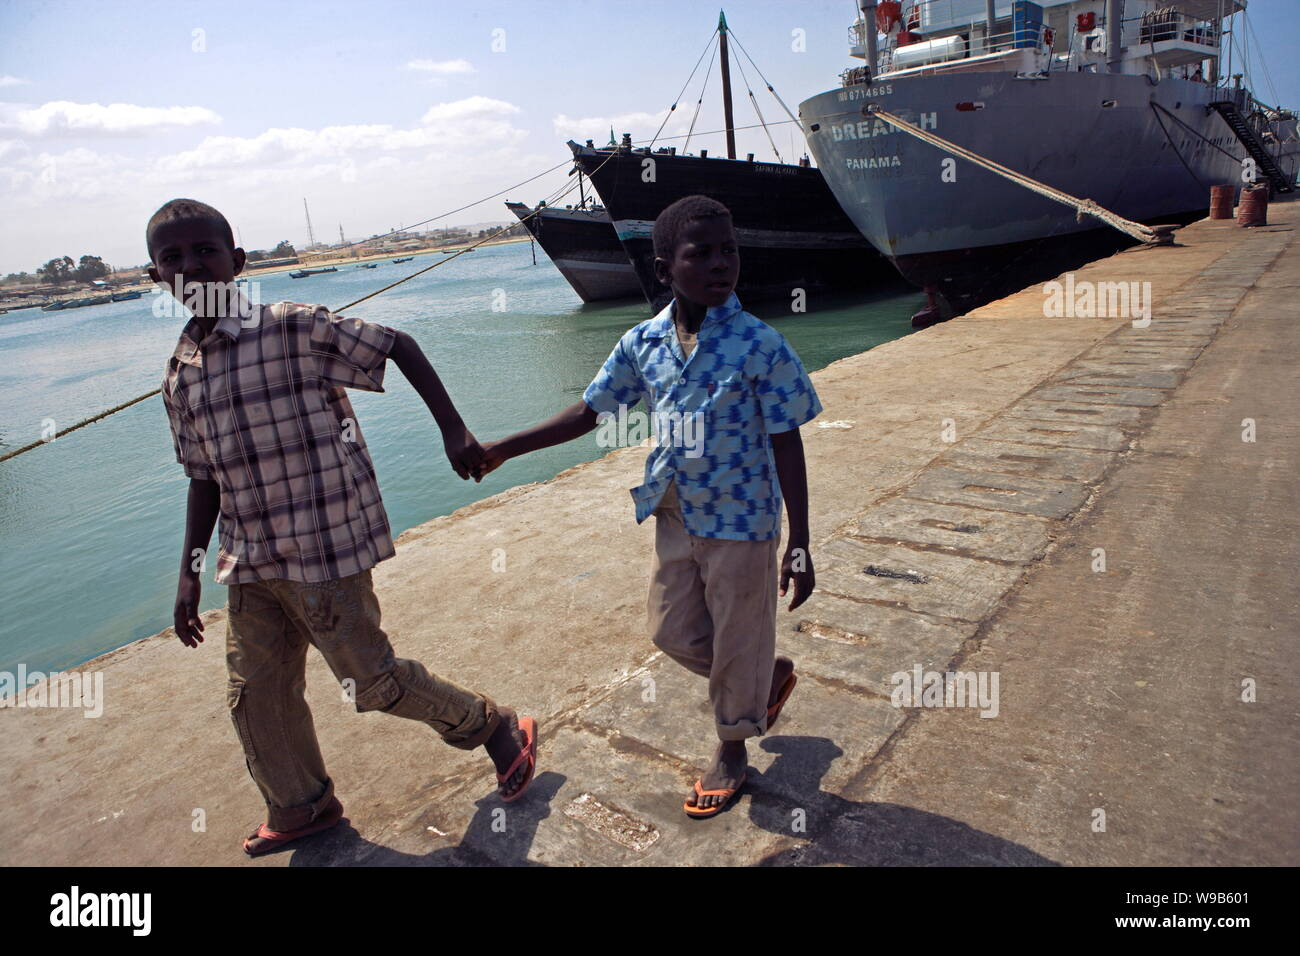 Somali Children Stock Photos & Somali Children Stock Images